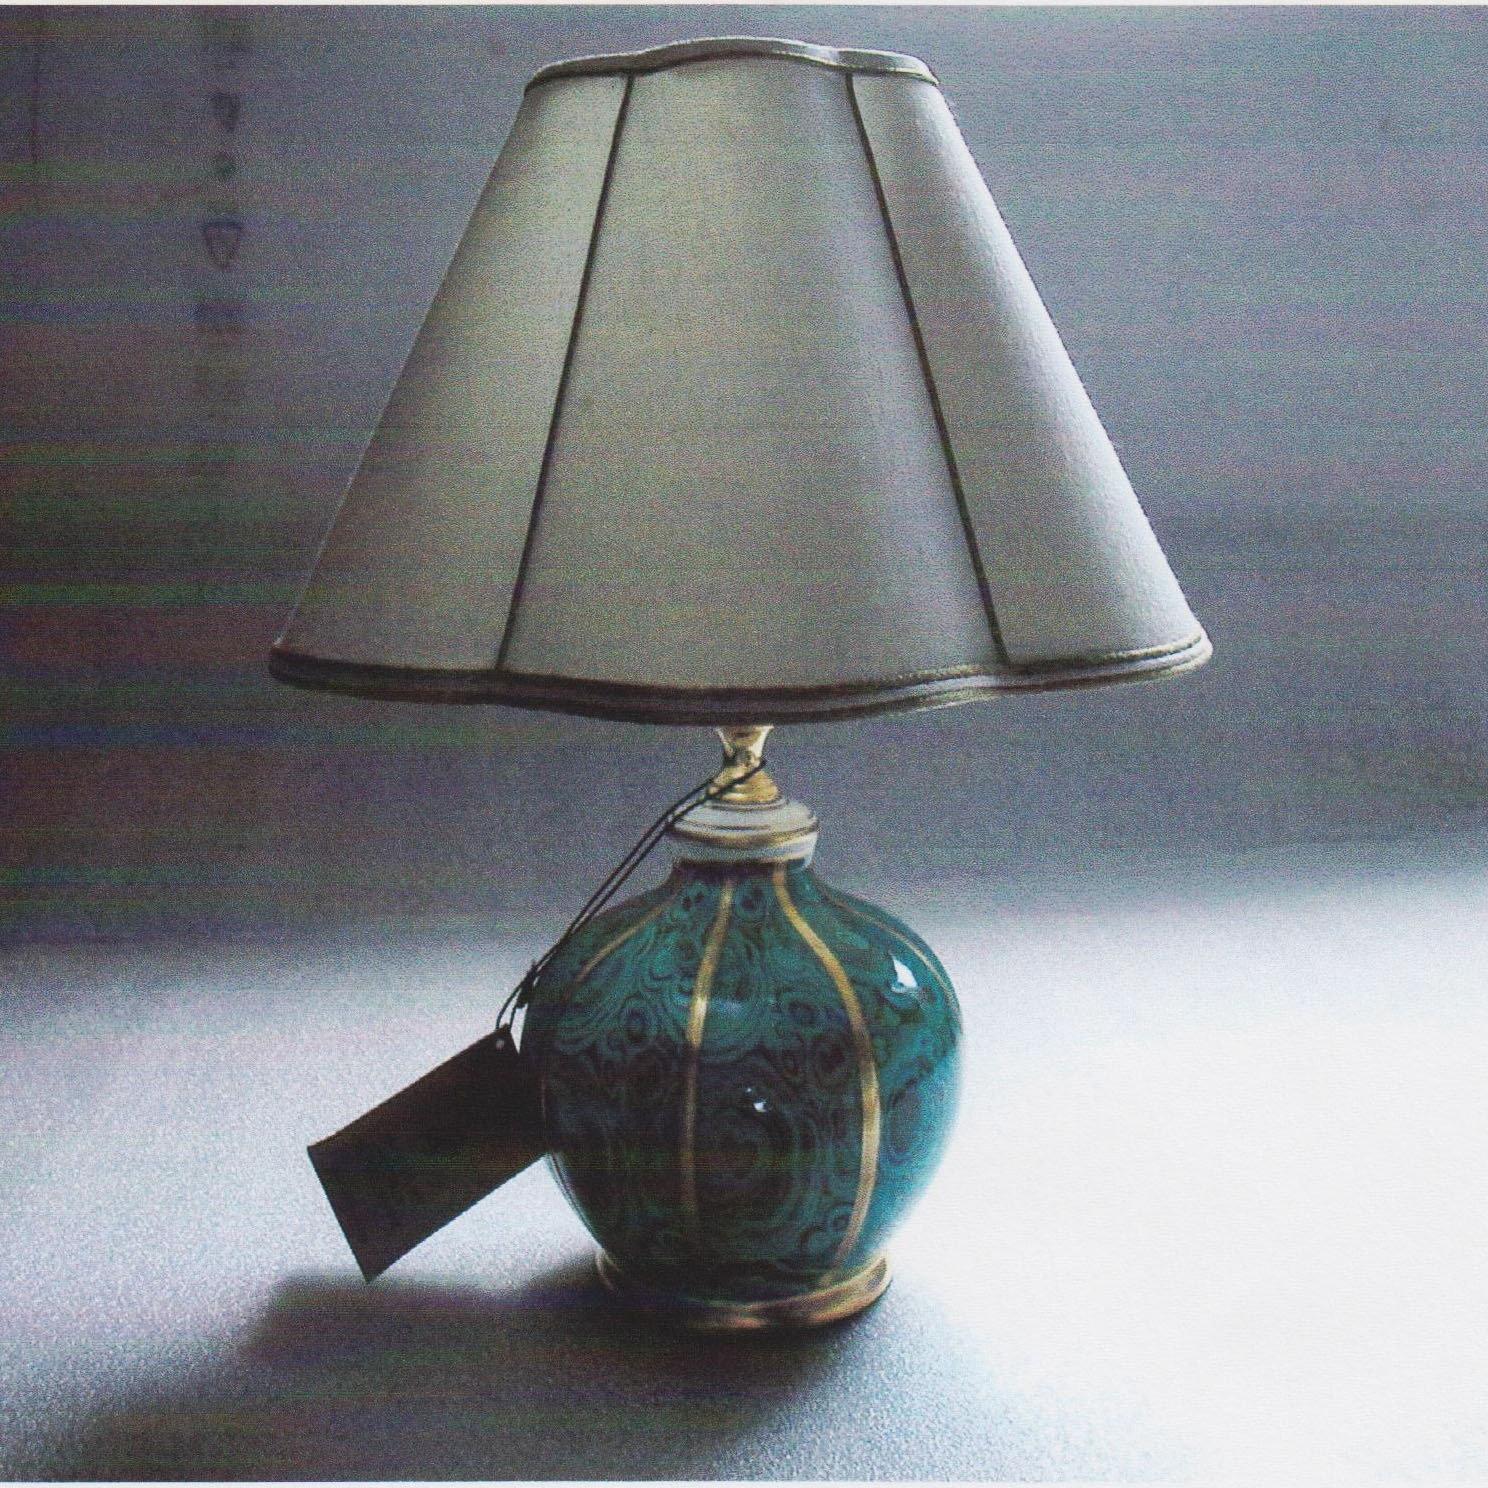 Abat jour mondo convenienza free lampade comodino mondo for Mondo convenienza lampade